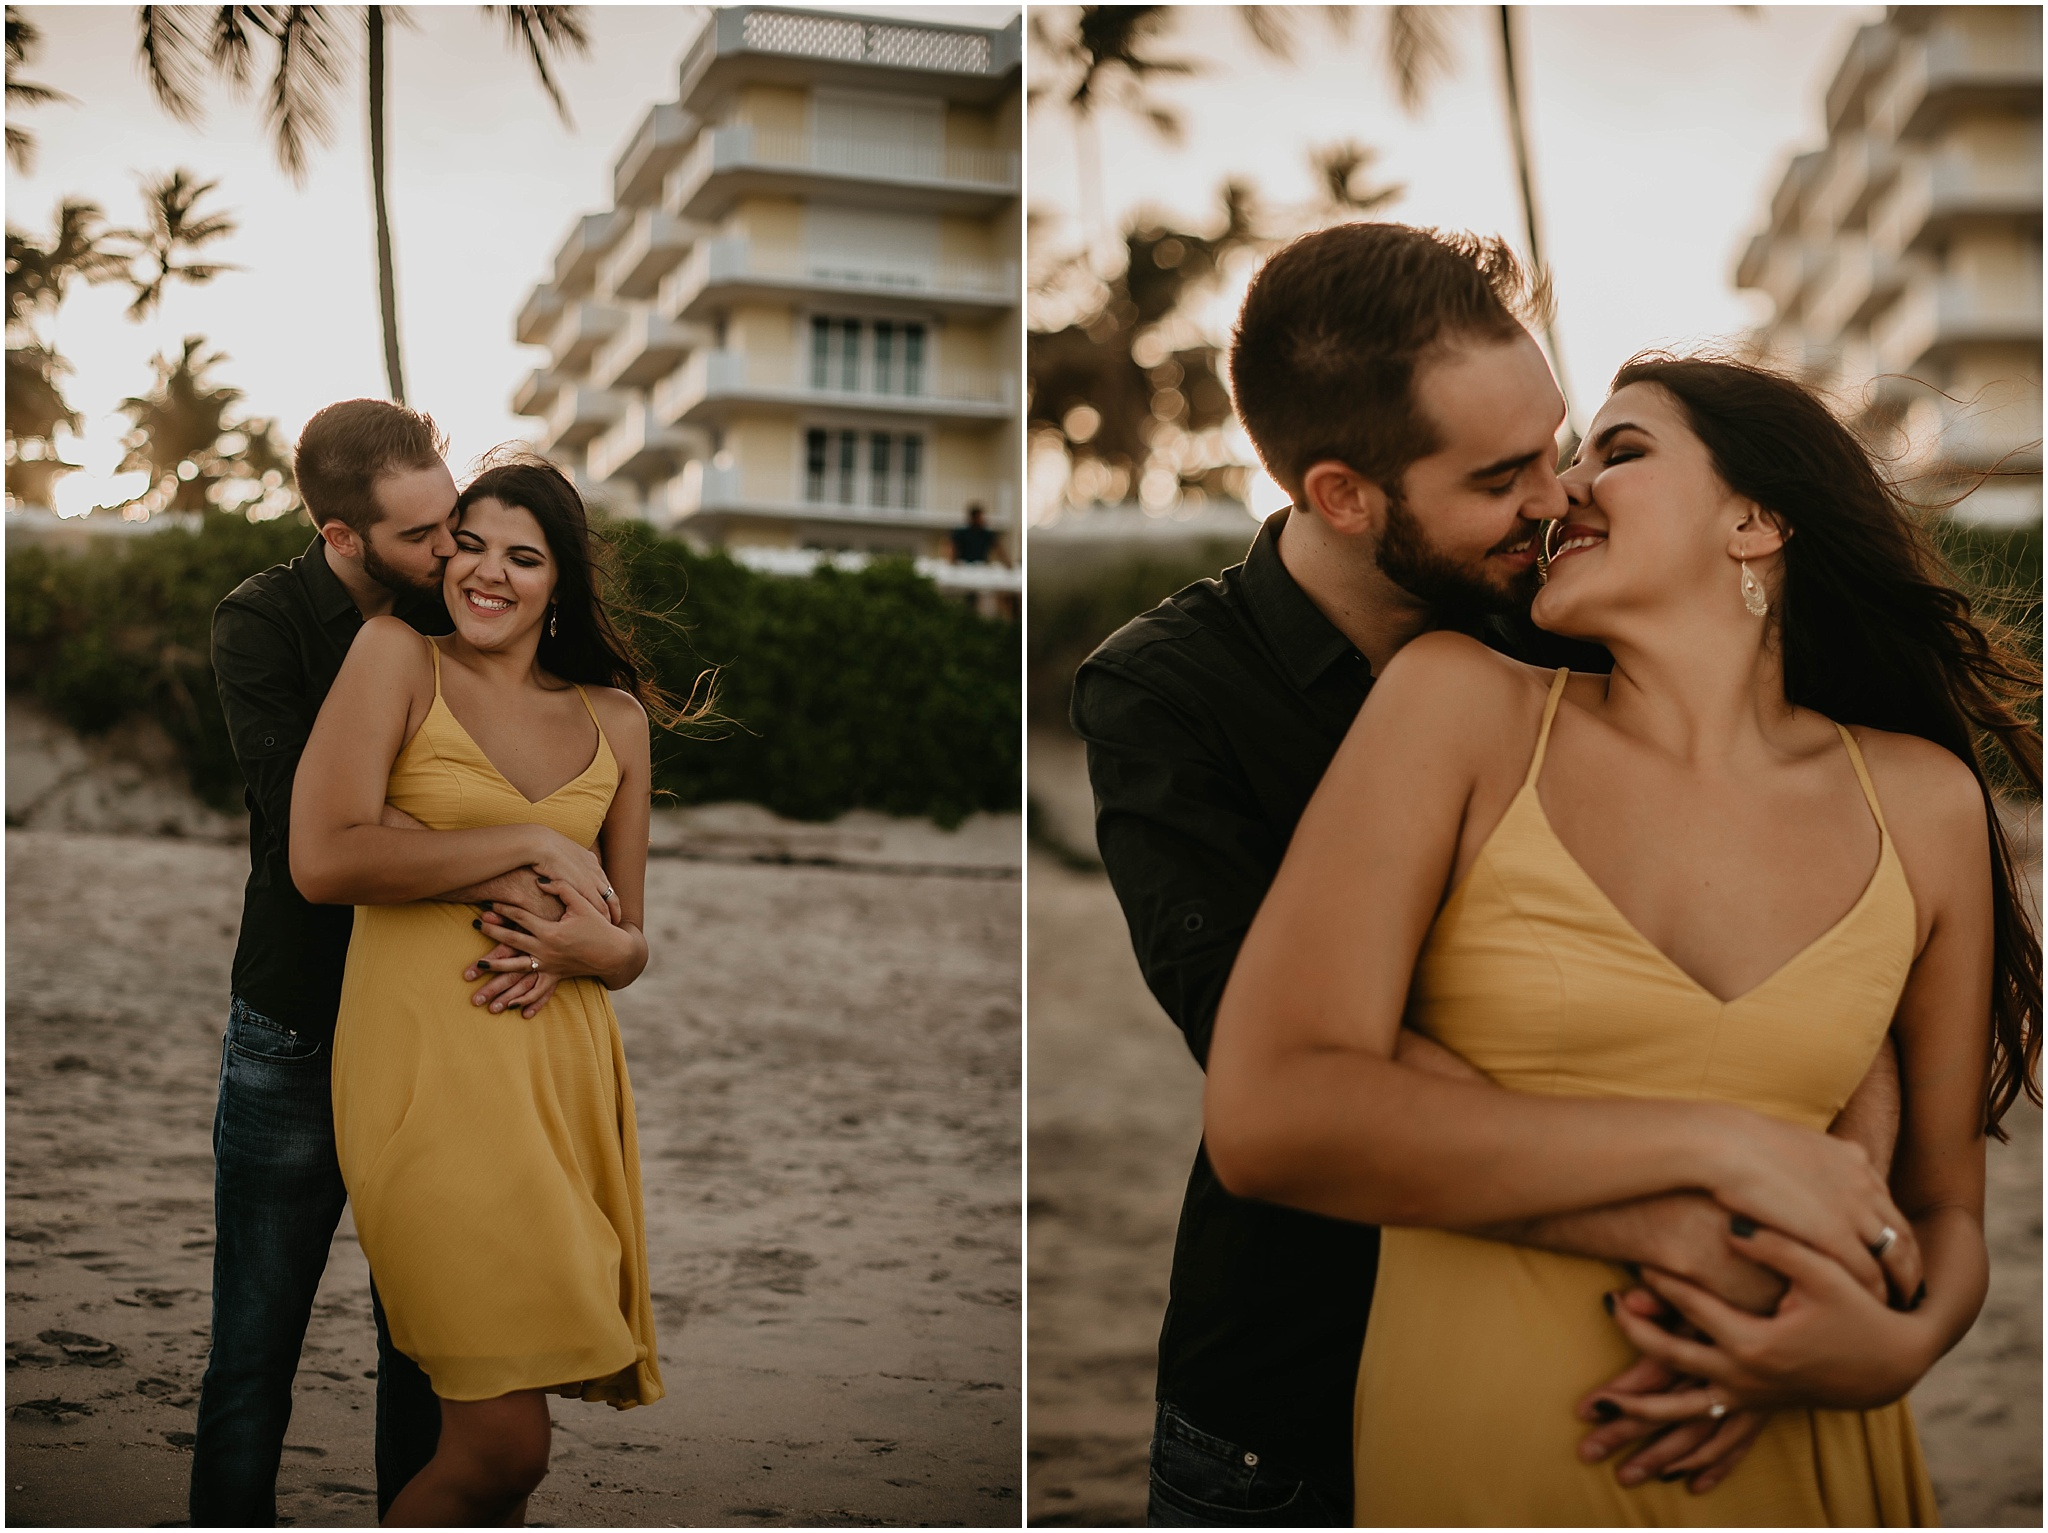 Worth-Avenue-Palm-Beach-engagement-photographer_0016.jpg